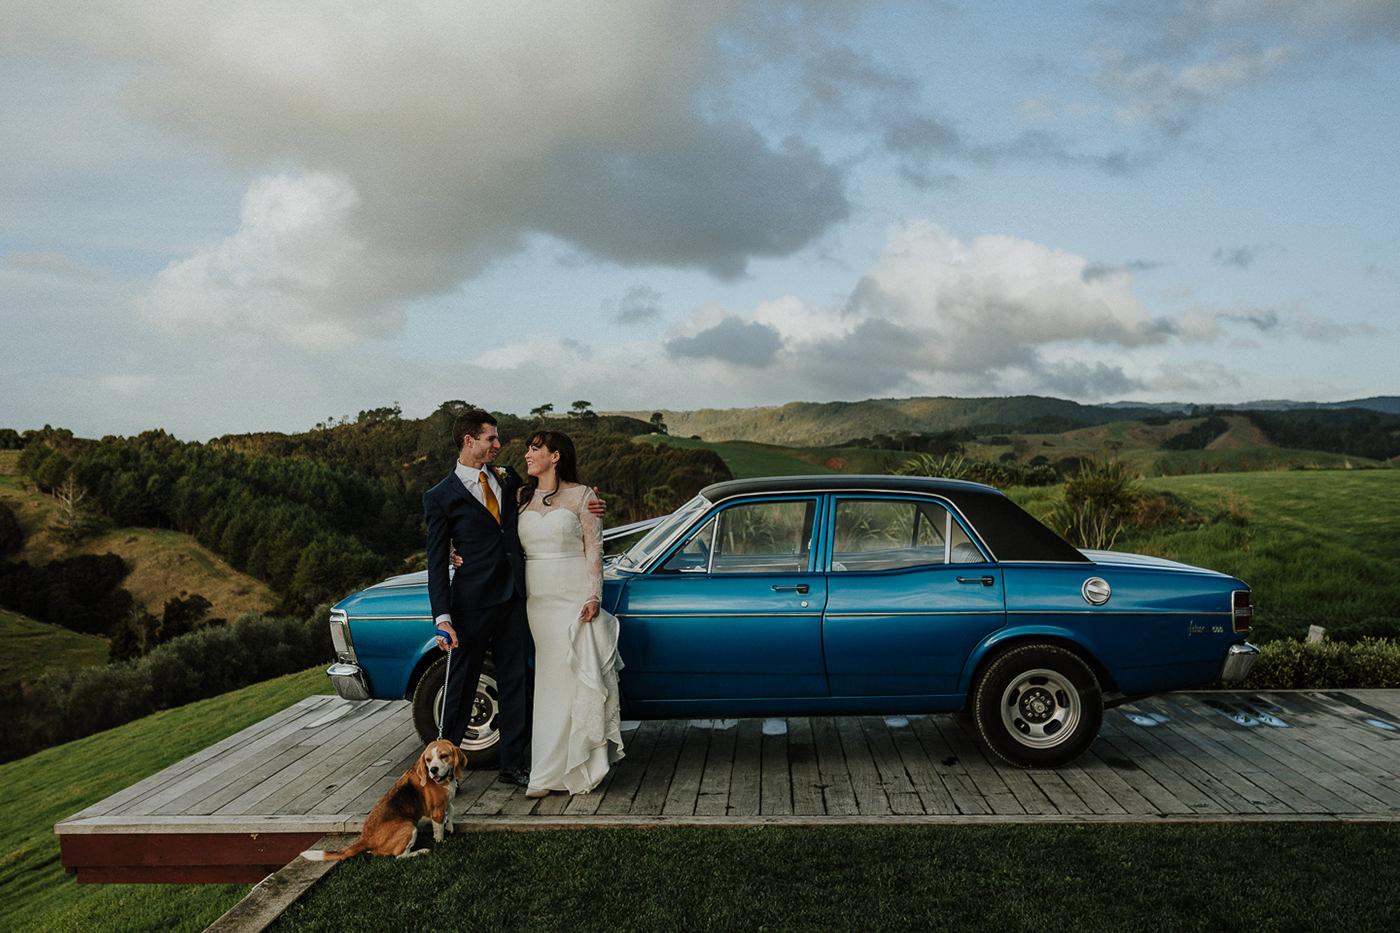 wedding_photographer_nz-00065.jpg